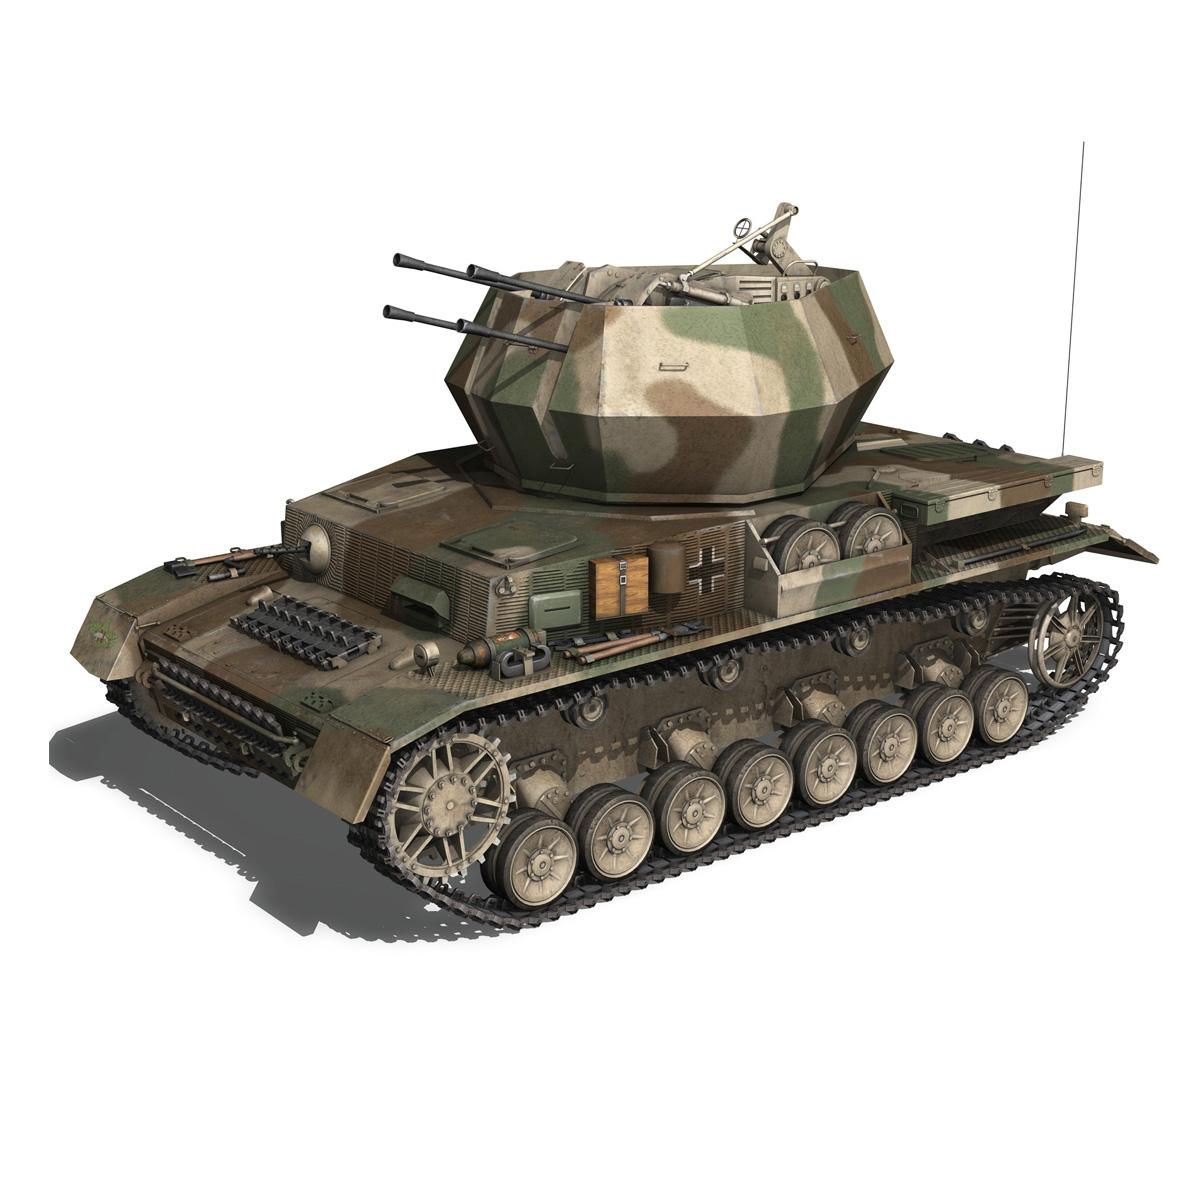 flakpanzer iv – wirbelwind – spzjgabt 654 3d model 3ds fbx c4d lwo obj 282305